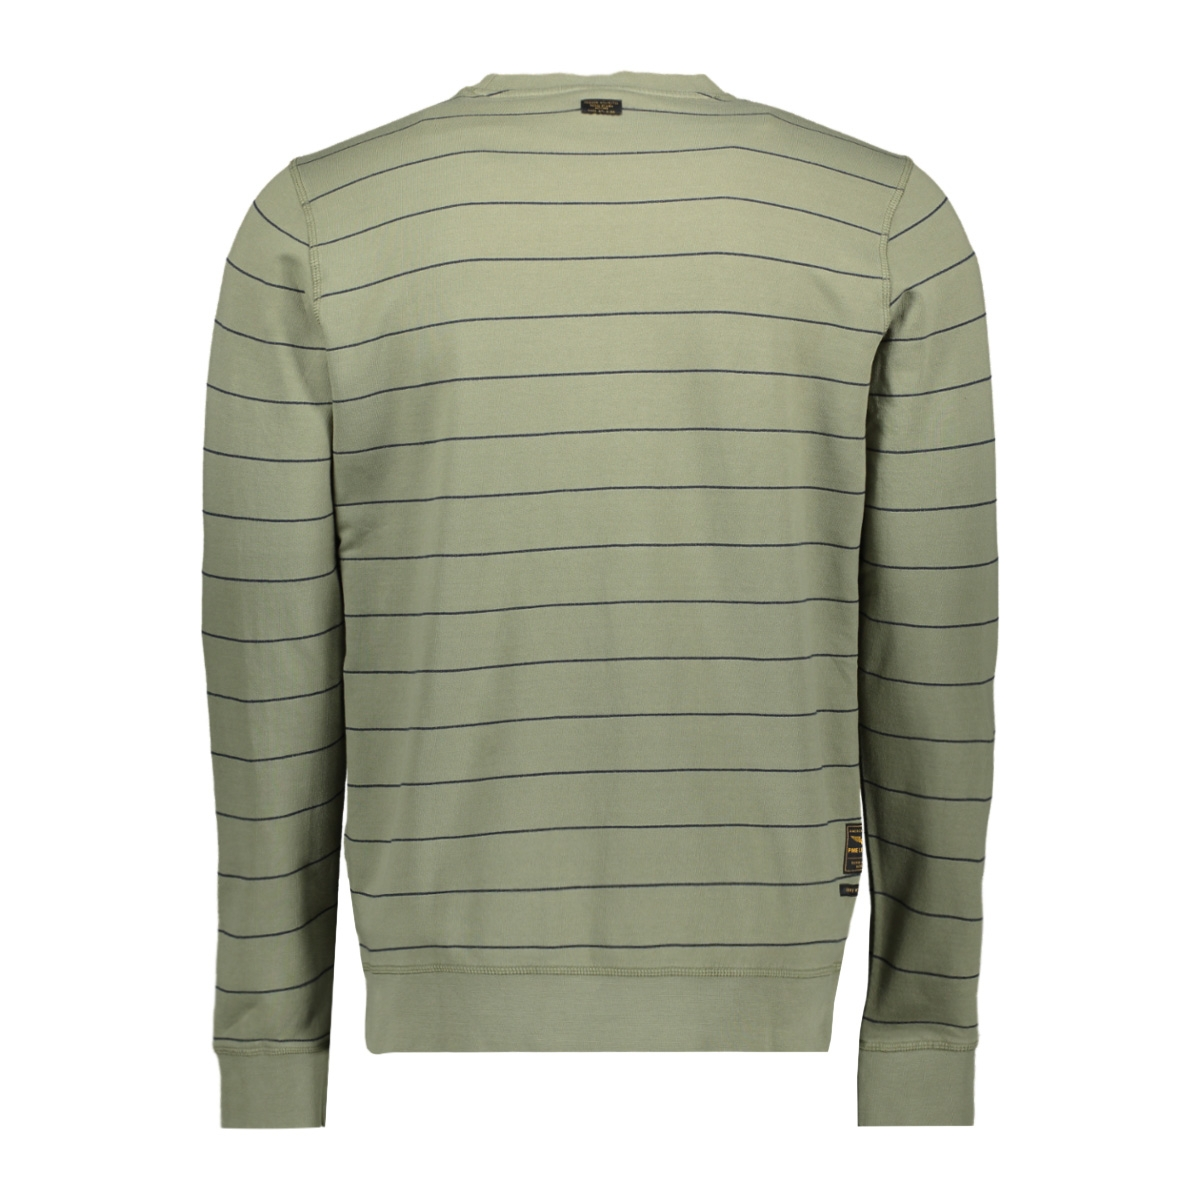 long sleeve t shirt pts198515 pme legend t-shirt 6149